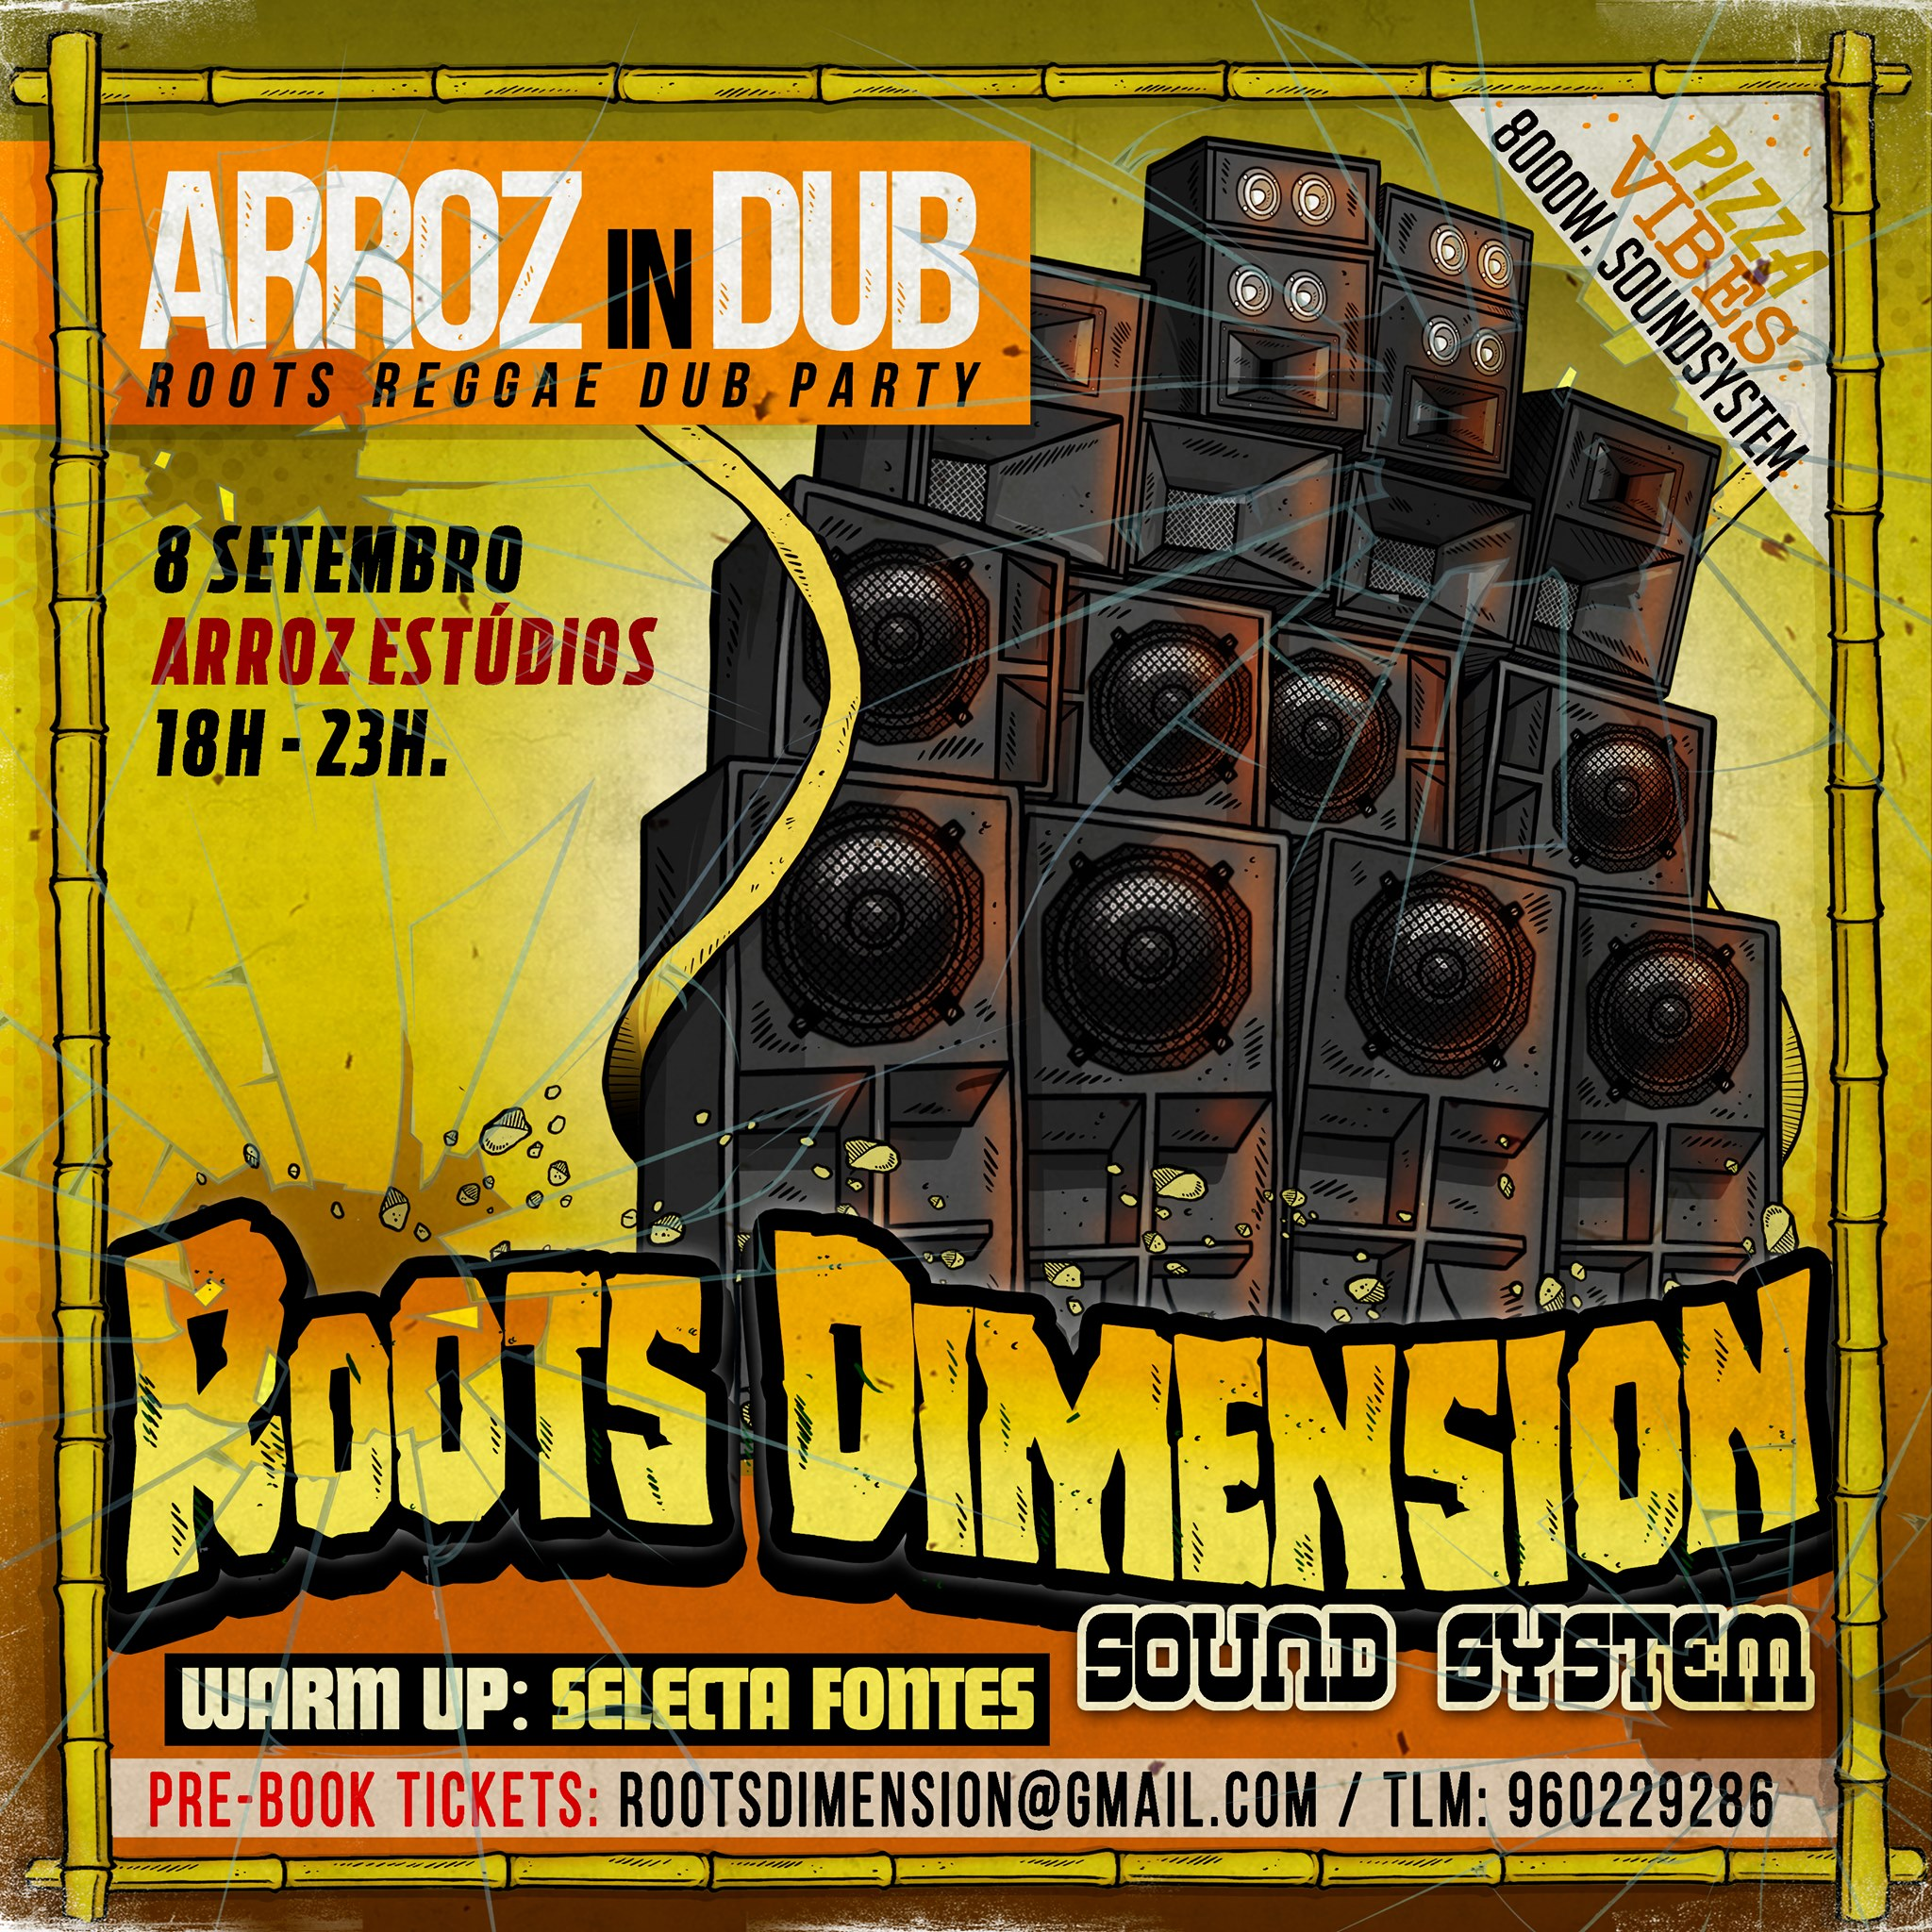 Arroz in Dub - Roots Reggae Dub Party